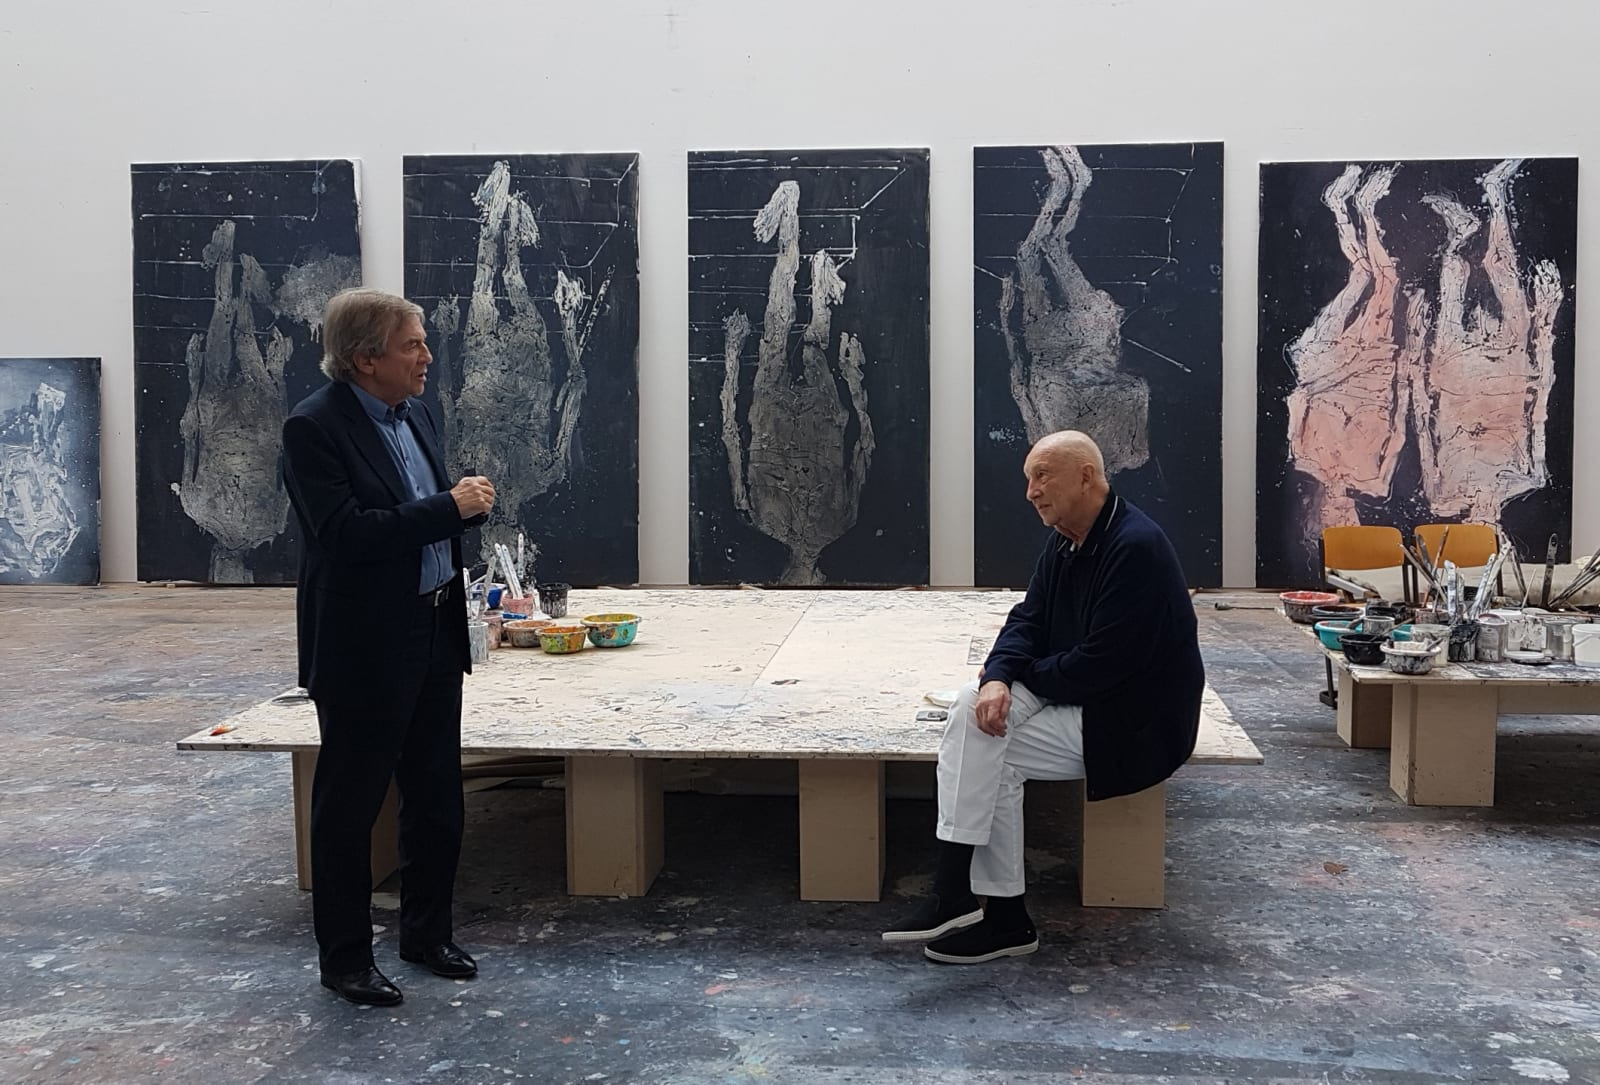 <p>Alan Cristea and Georg Baselitz in Baselitz's studio, 2018. Photo: Leeor Engländer</p>